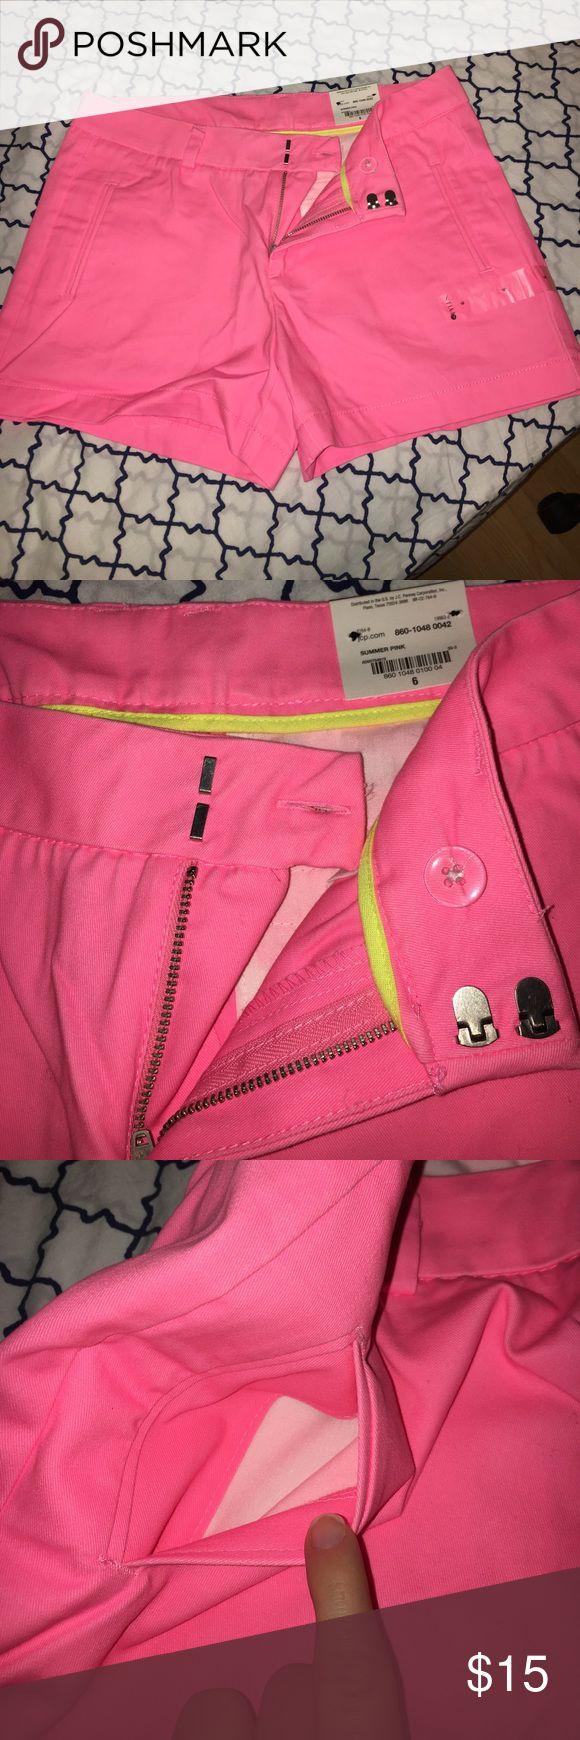 Hot pink shorts Stylus brand hot pink shorts Stylus Shorts